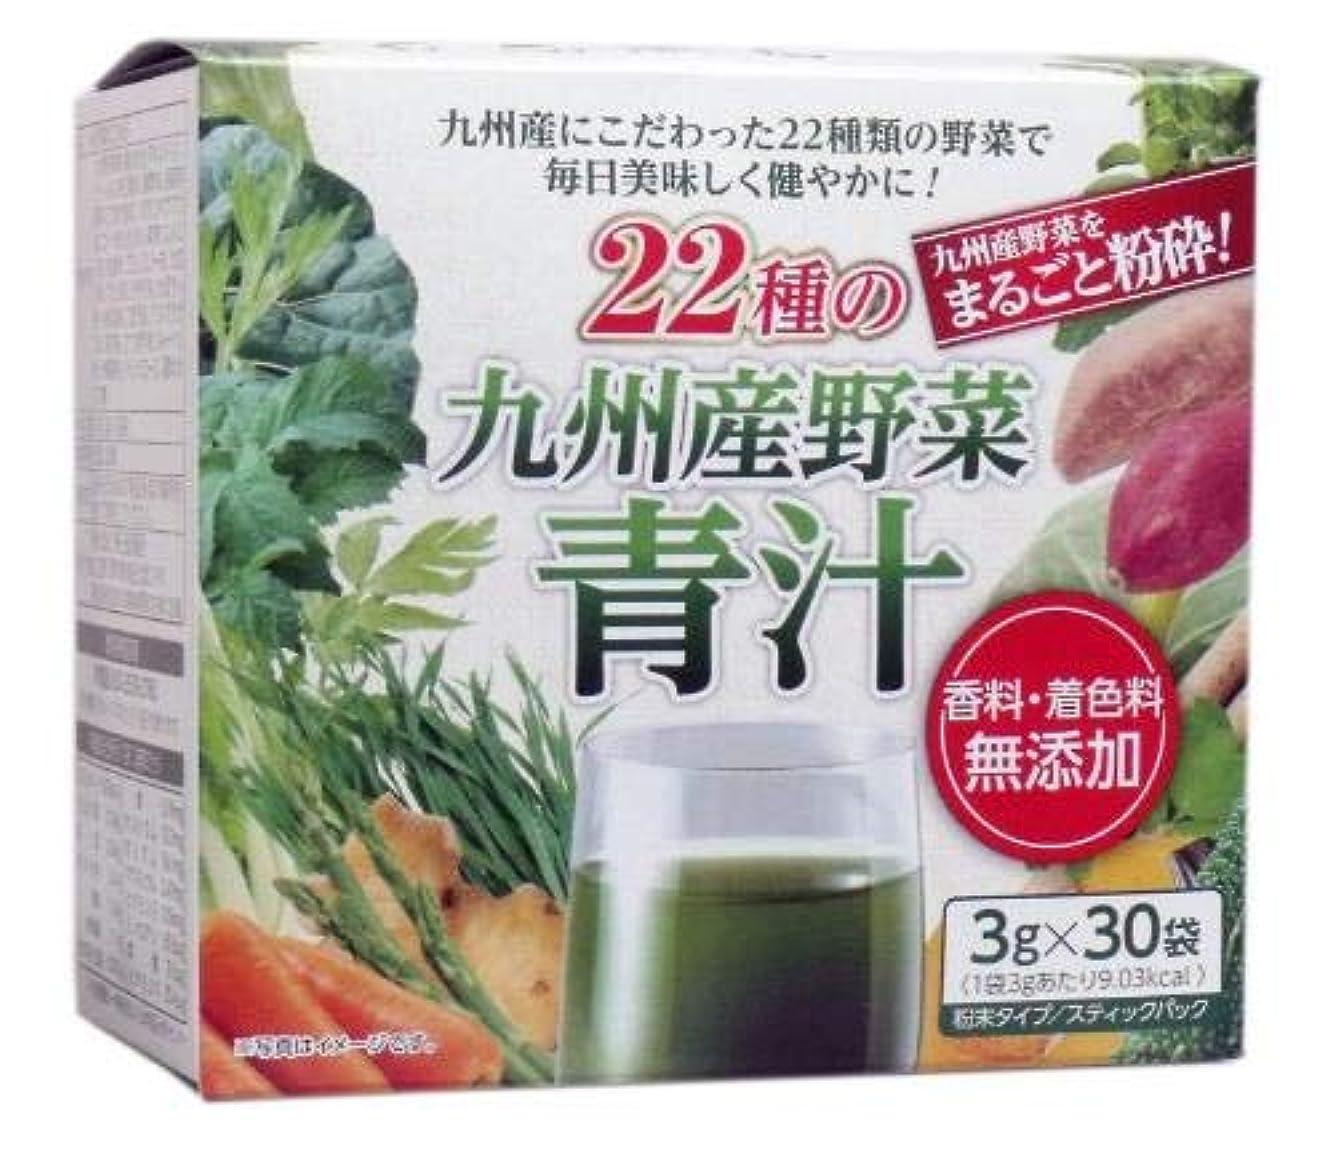 計算可能出血発表する新日配薬品 22種の九州産野菜青汁 3g×30袋入×4個